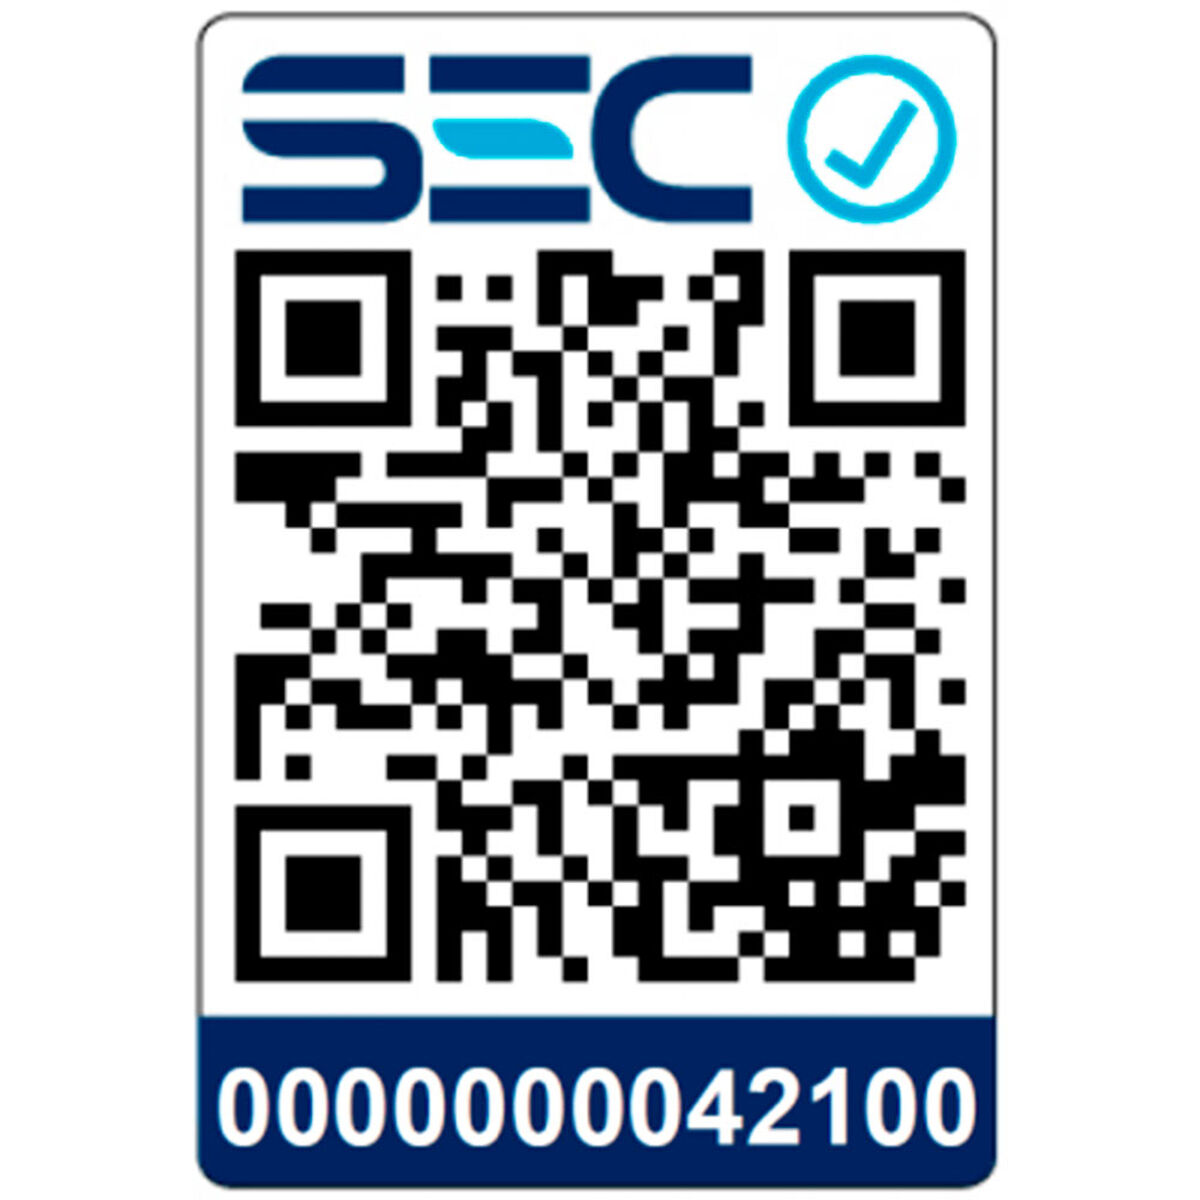 Termo Eléctrico De Piso Albin Trotter ATM 200 Litros